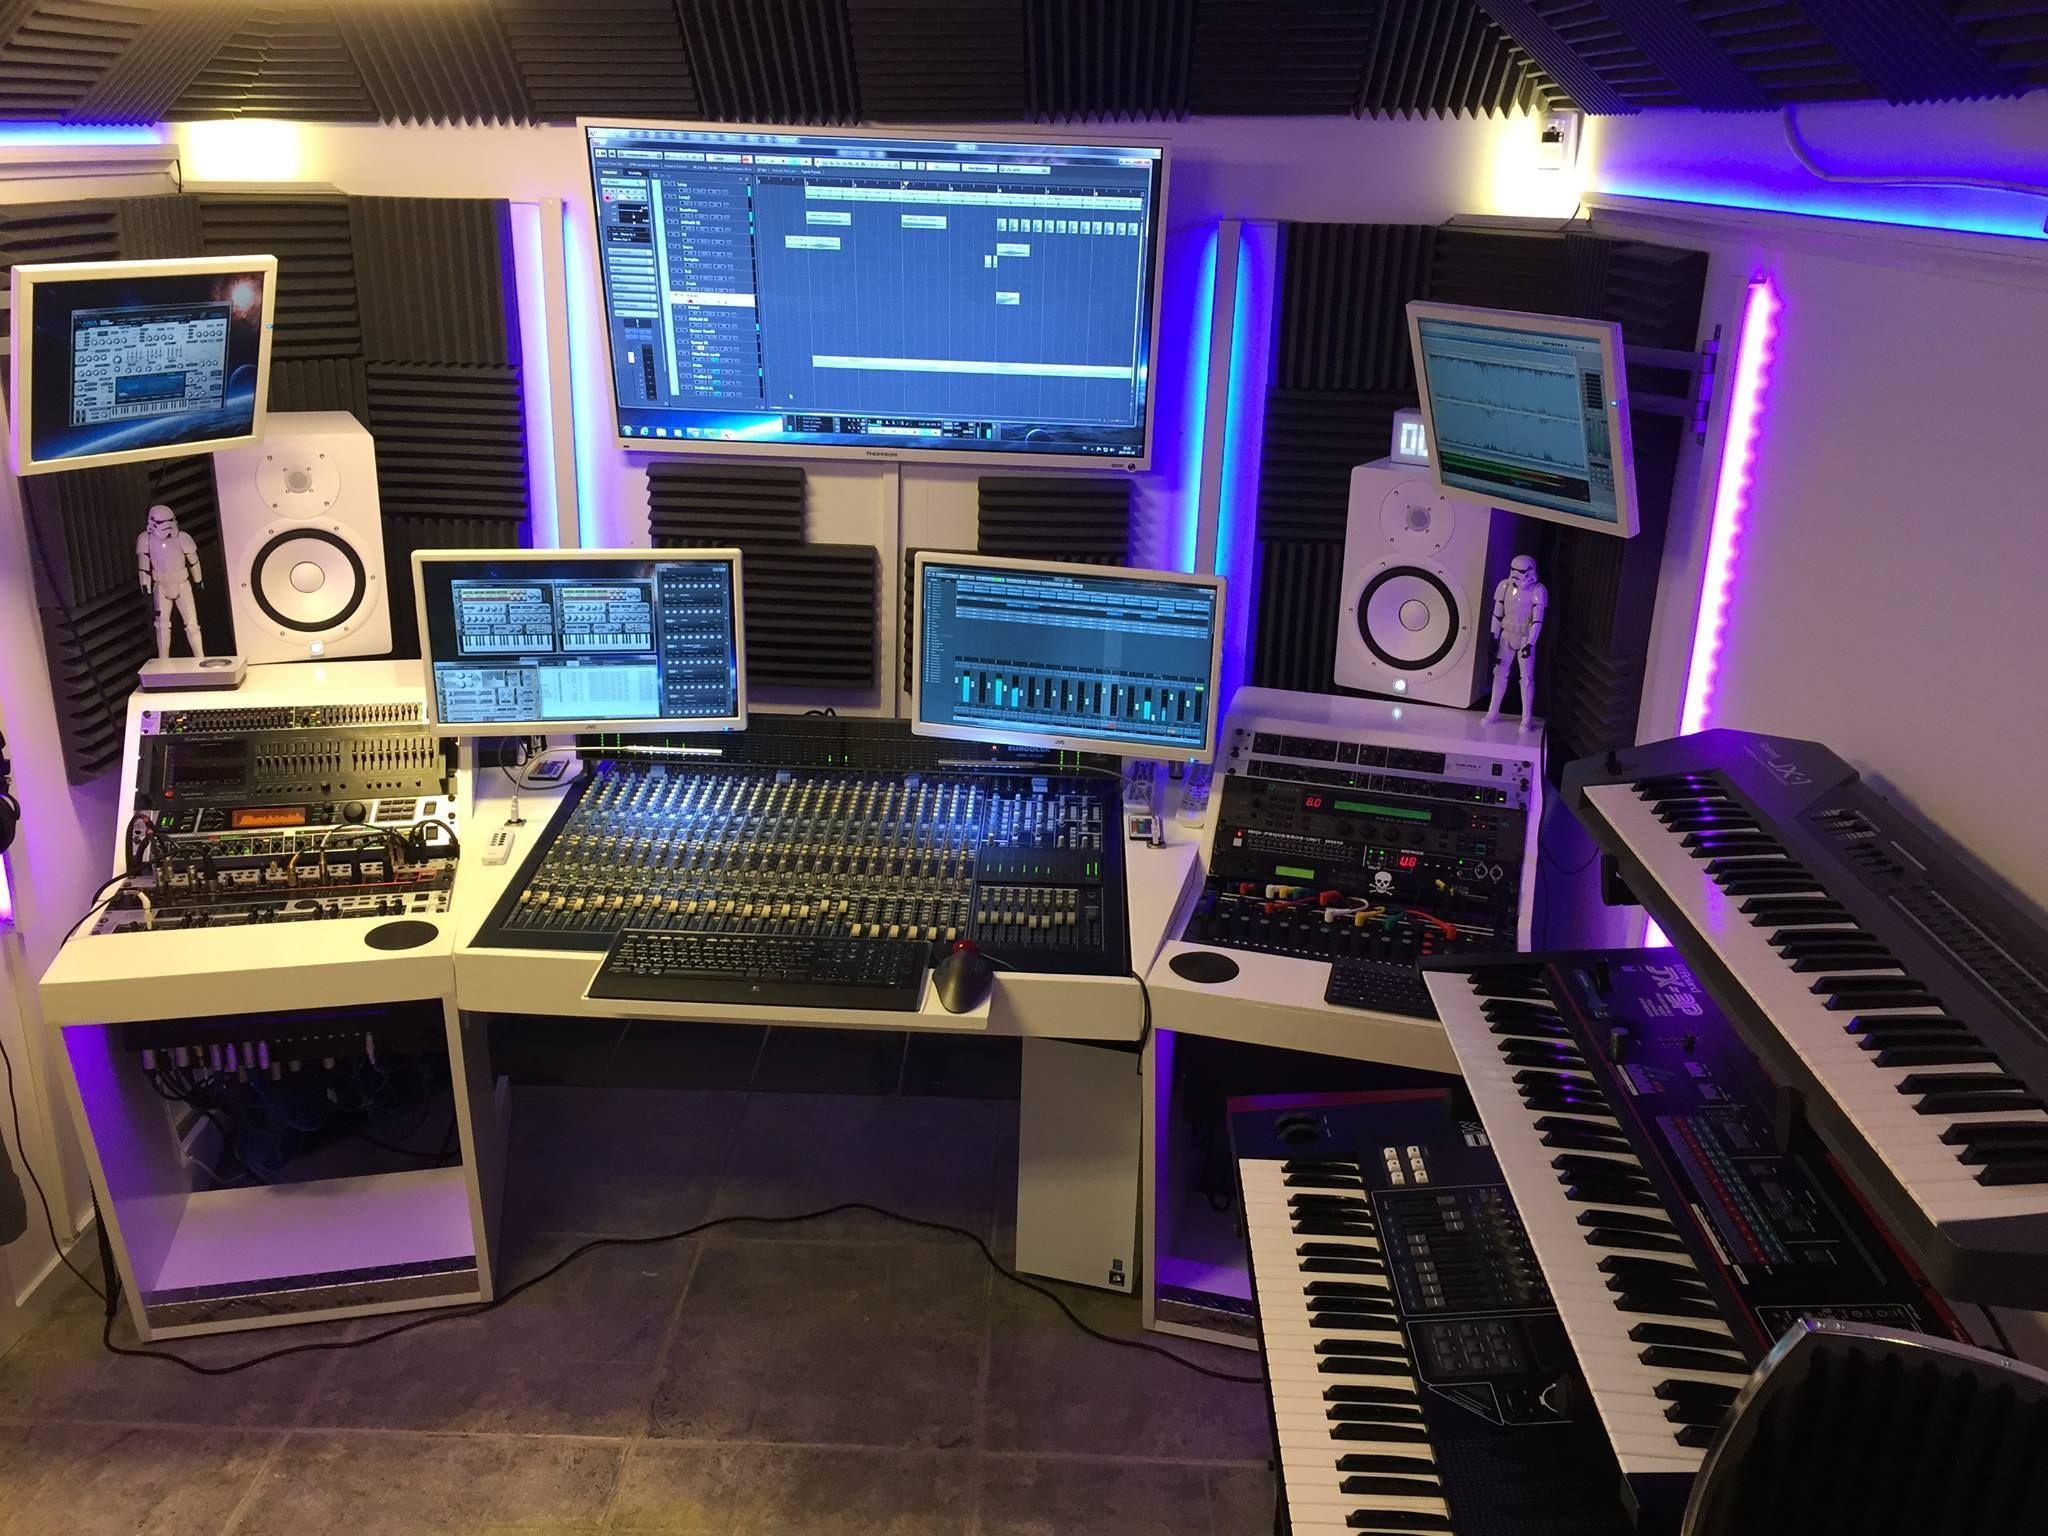 pin by brandon hughes on studio in 2019 home studio music recording studio home studio furniture. Black Bedroom Furniture Sets. Home Design Ideas